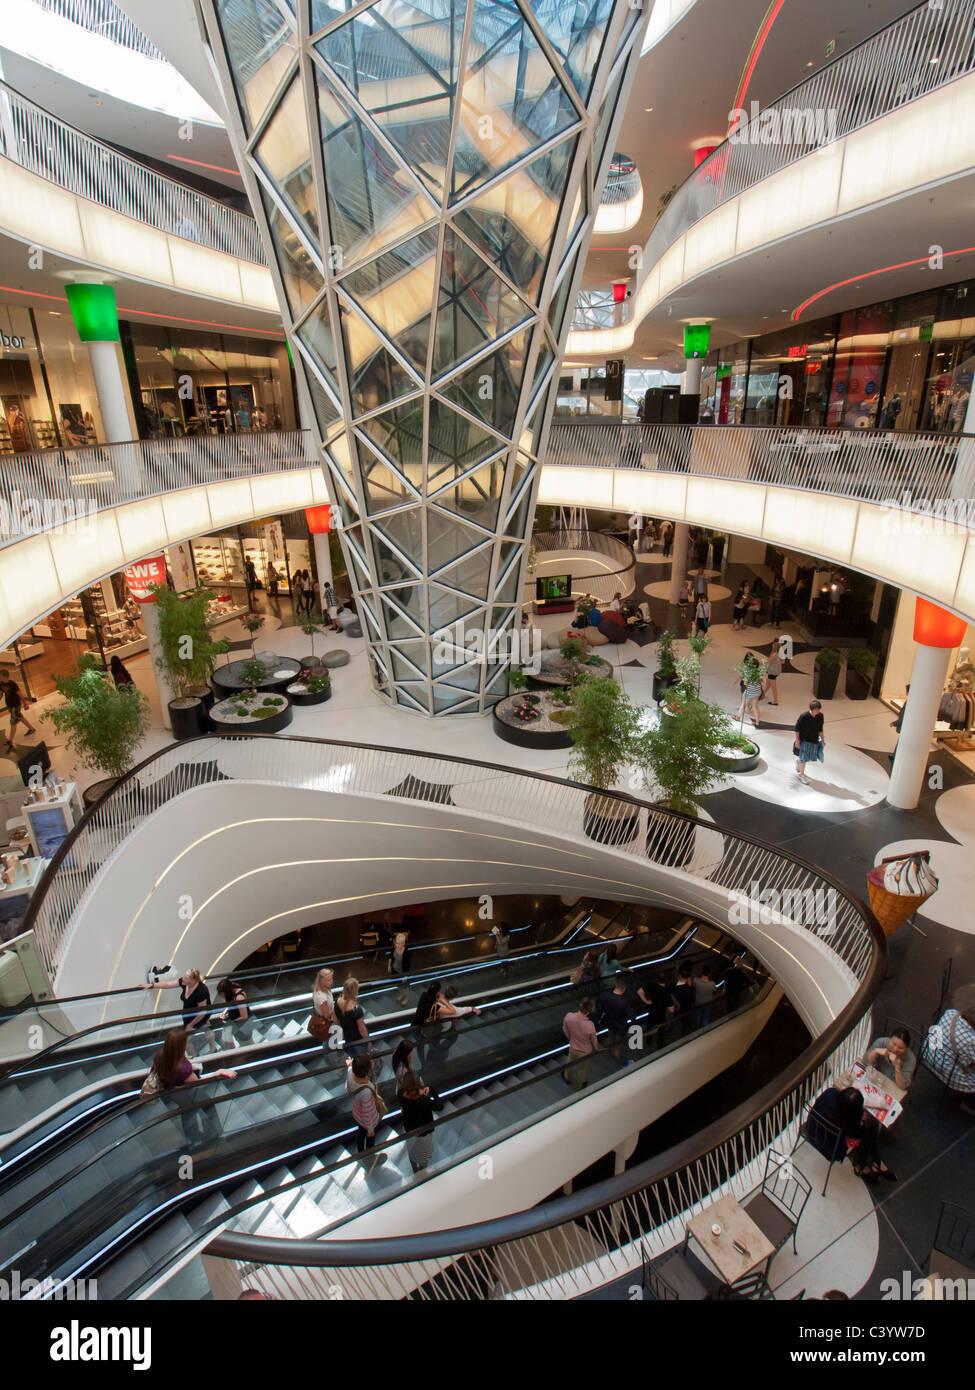 interior of new futuristic architecture of myzeil shopping mall in